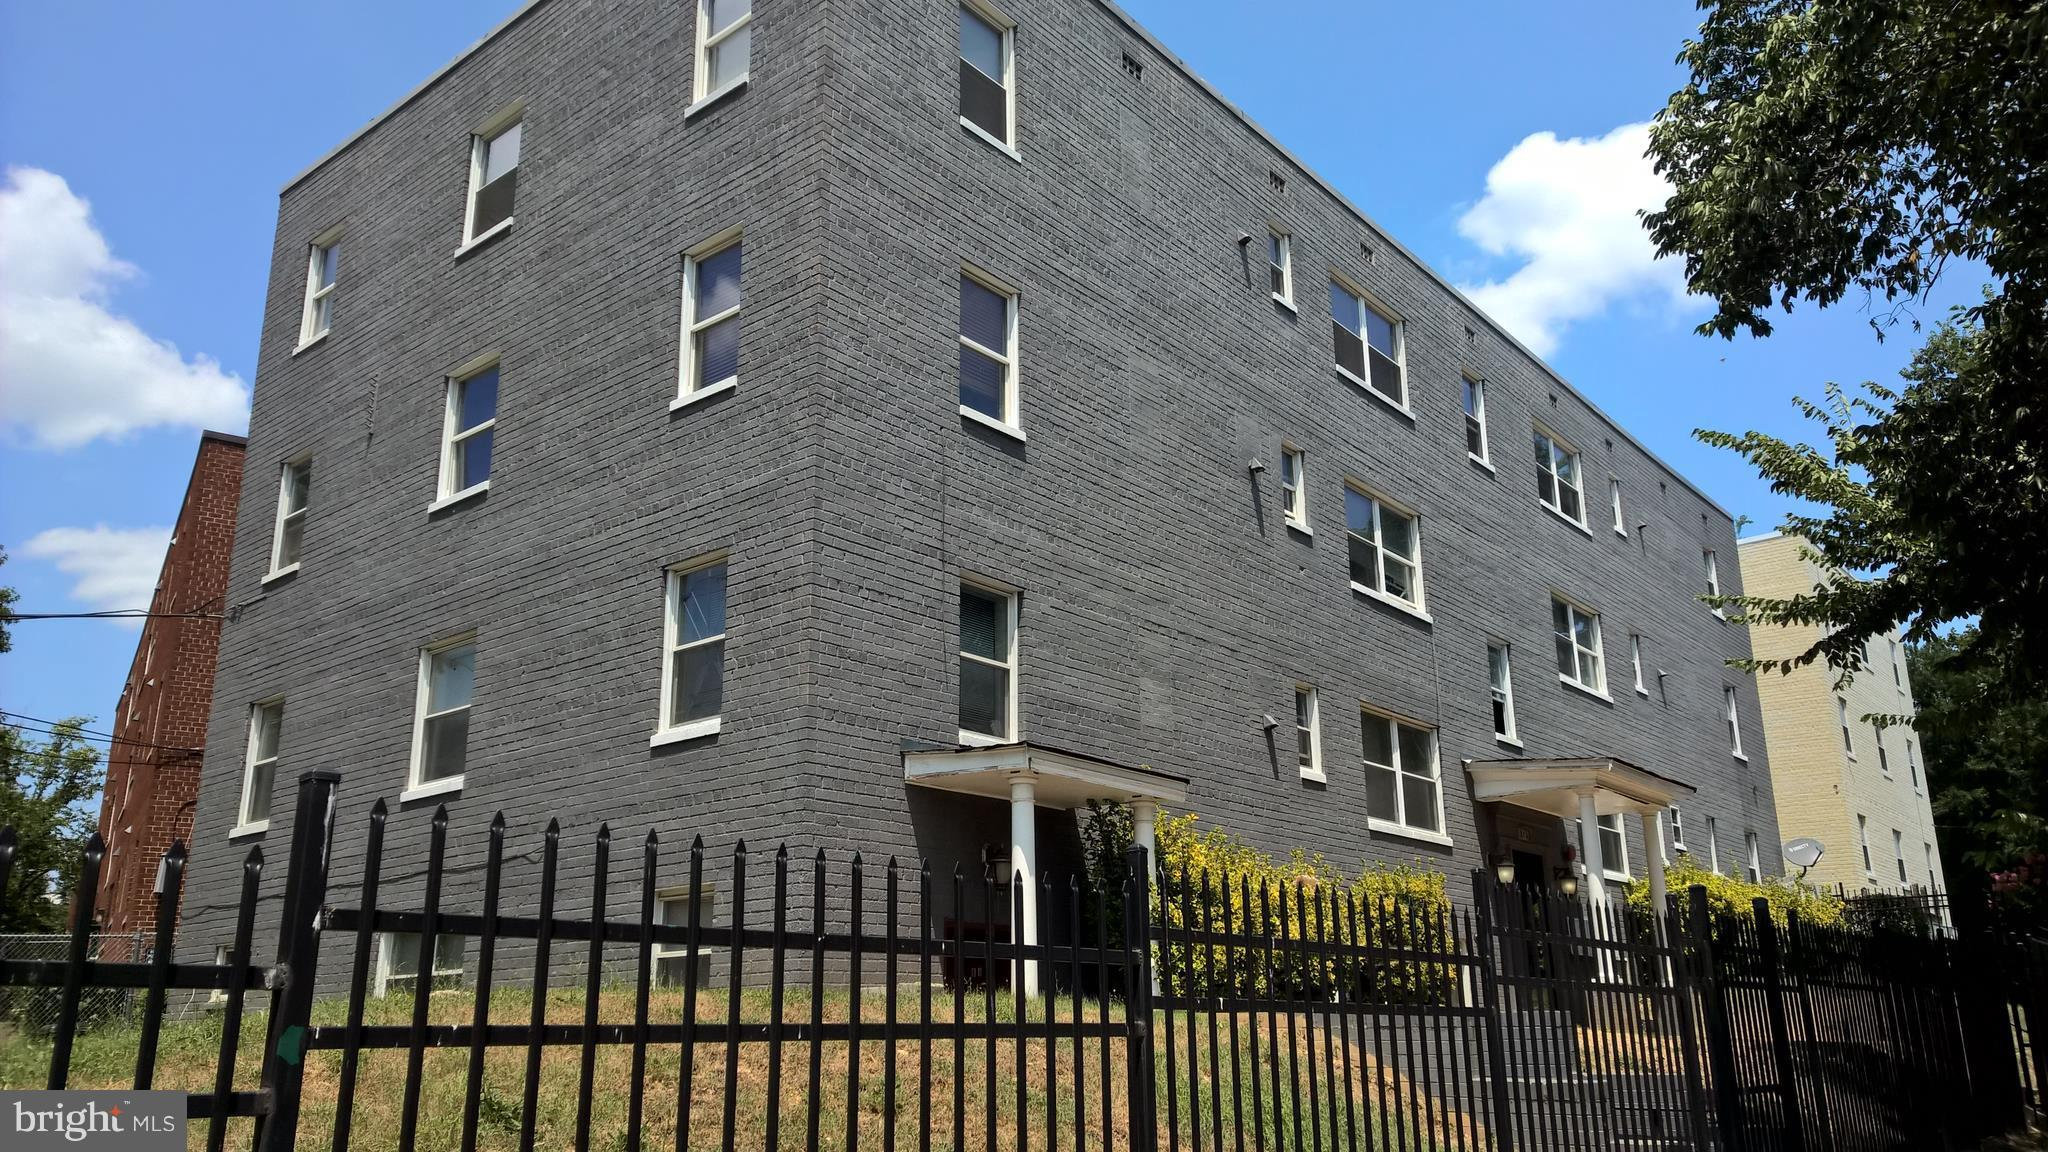 1300 CONGRESS STREET SE, WASHINGTON, DC 20032